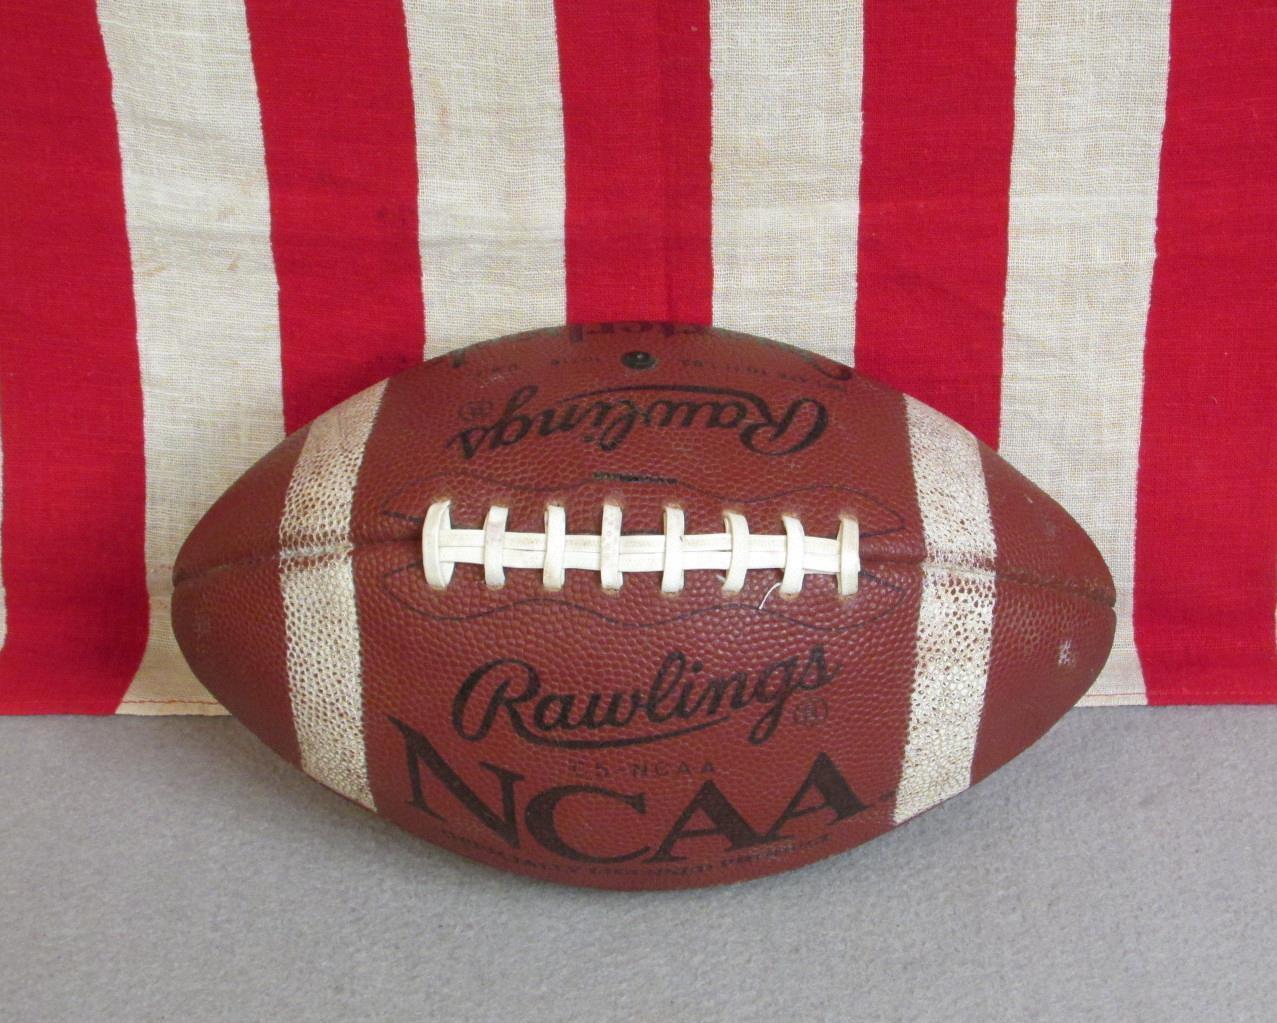 Clásicos Rawlings Cuero NCAA Fútbol Oficial Oficial Oficial Cordones Quarterback C-5 Modelo Bola 69aebf